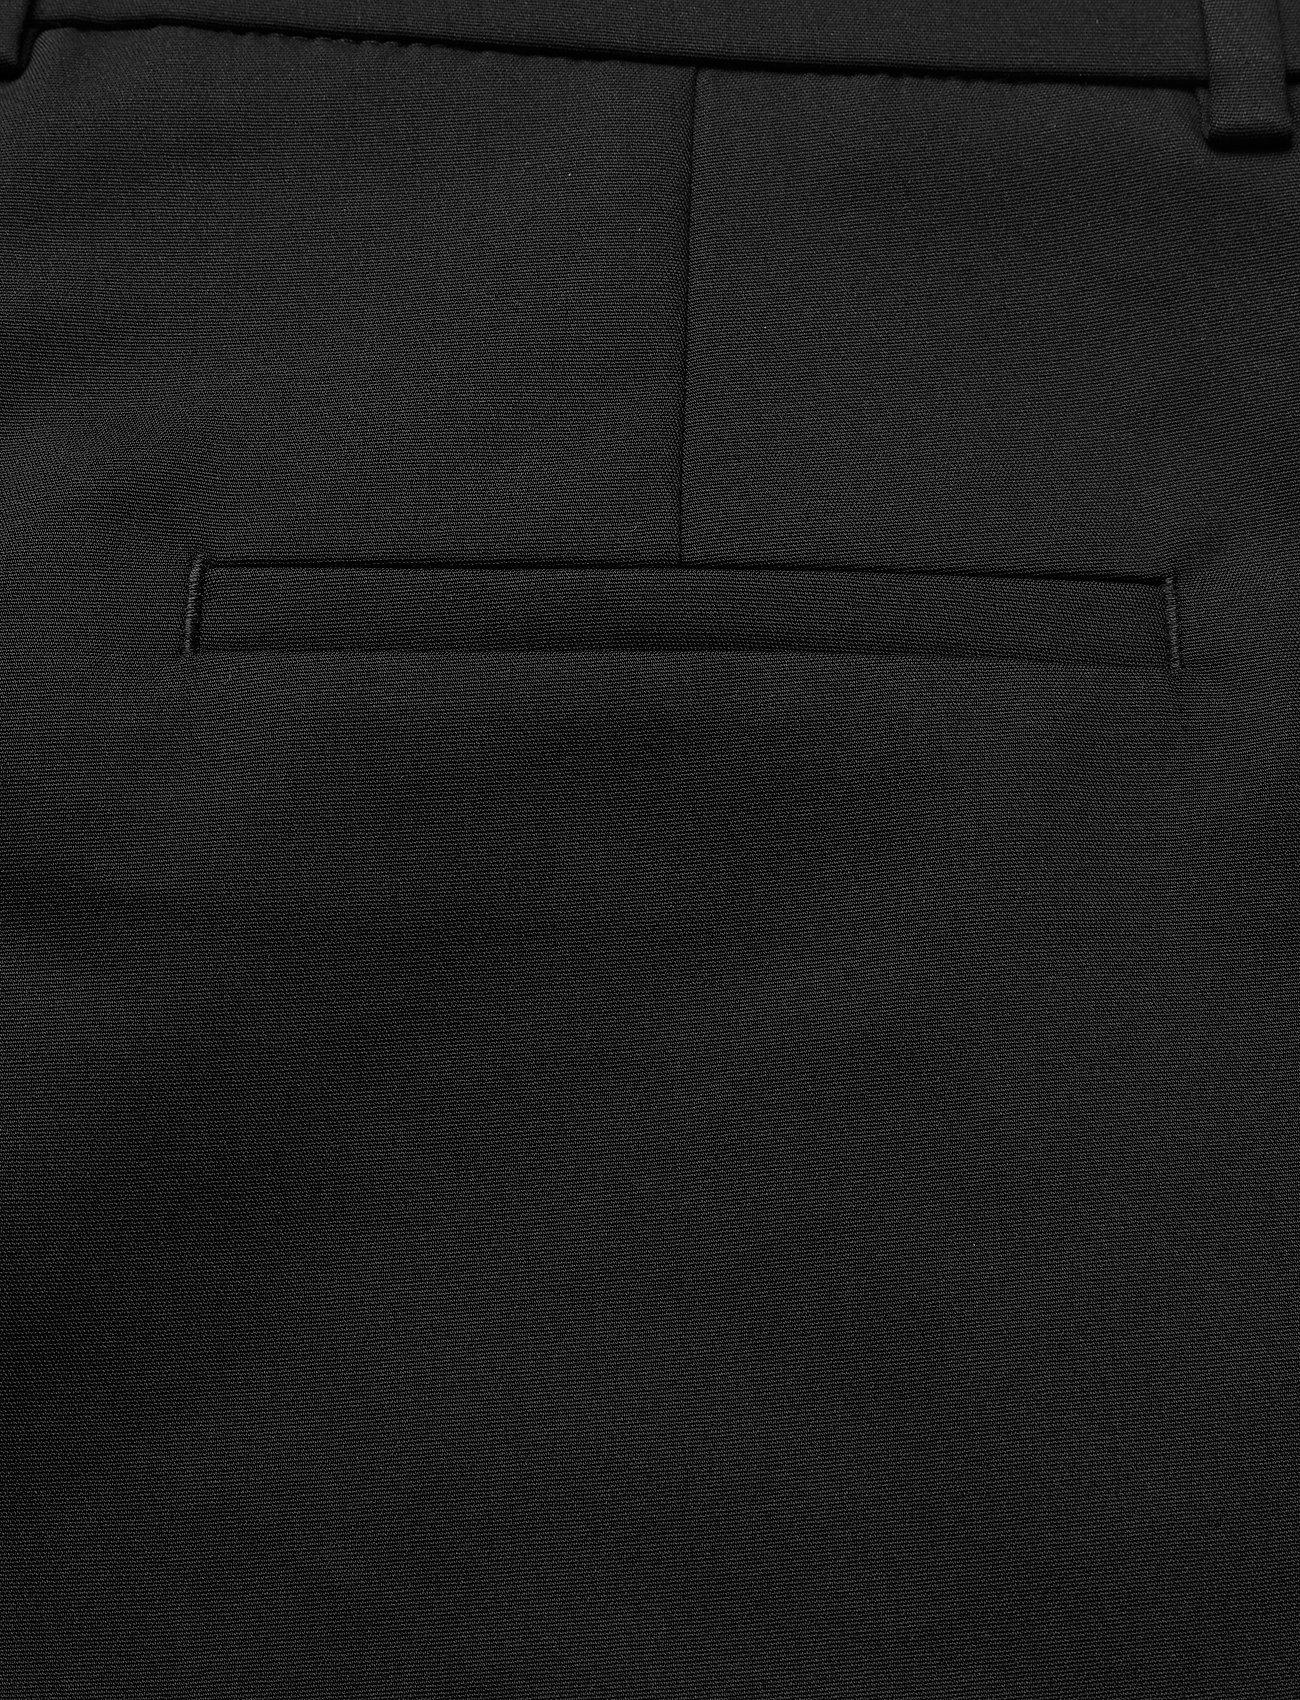 Fiveunits Angelie 633 Straight - Shorts Black Klarin